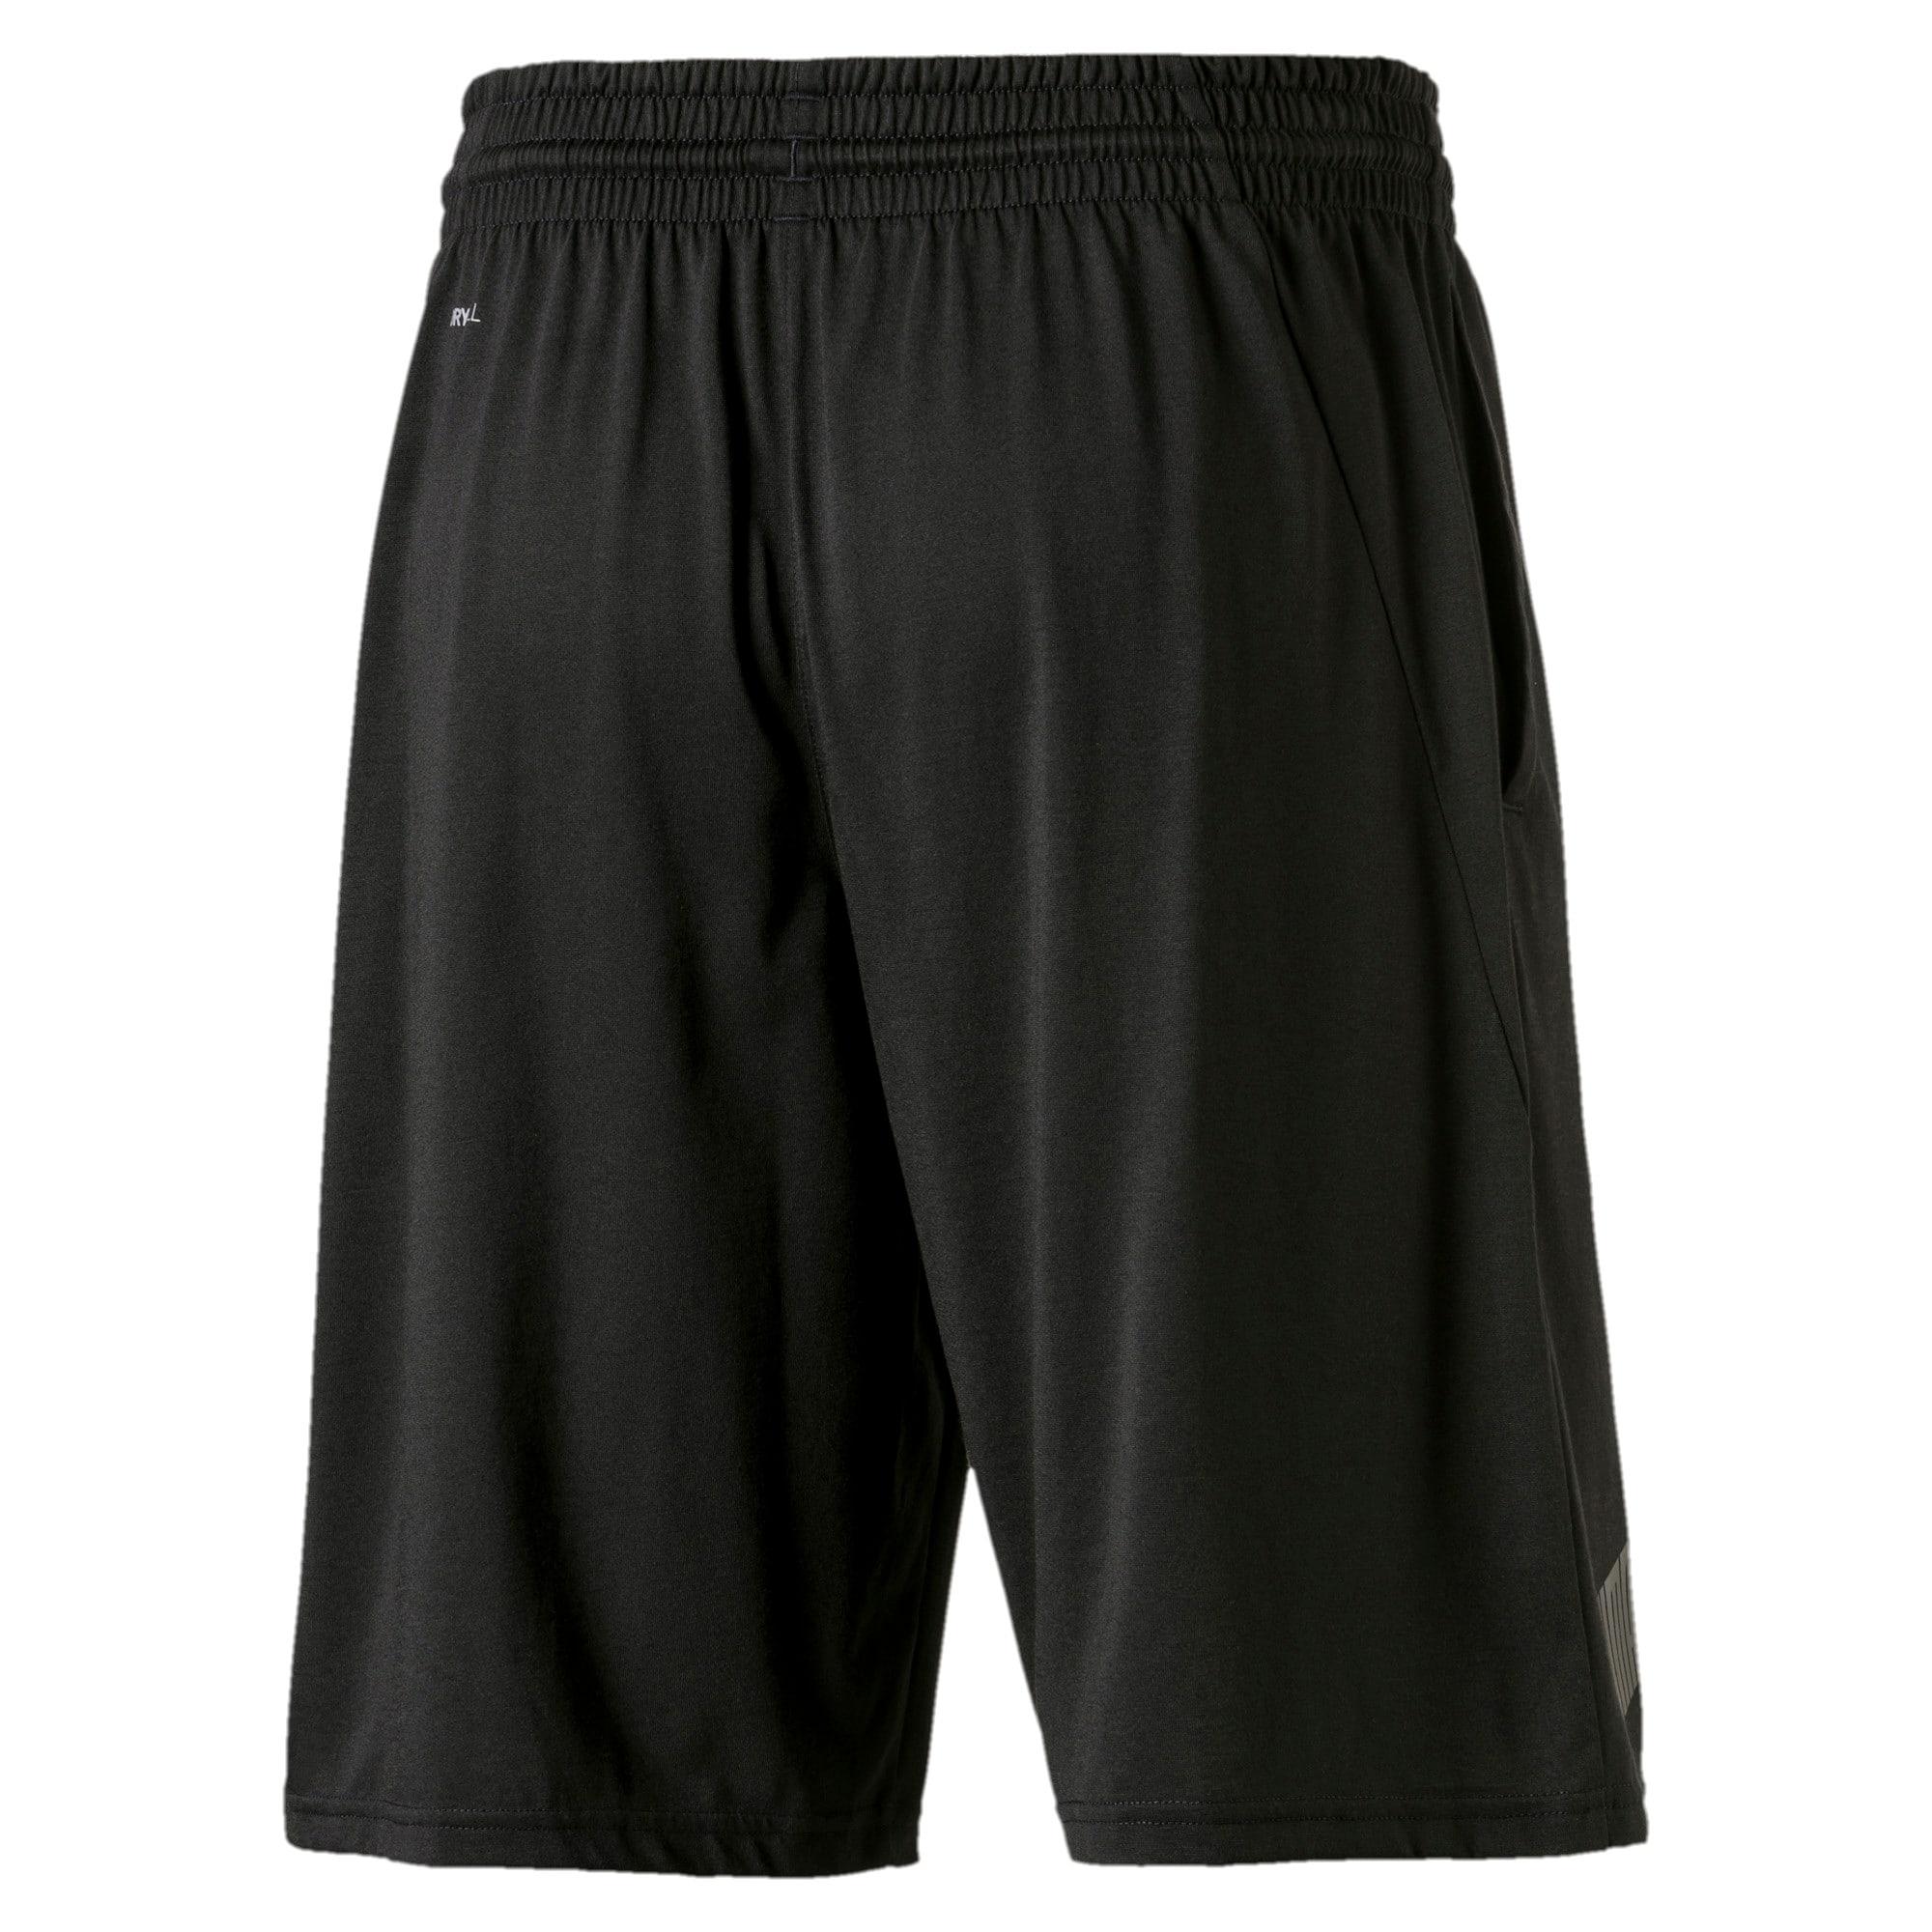 Thumbnail 5 of A.C.E. Knitted Men's Shorts, Puma Black, medium